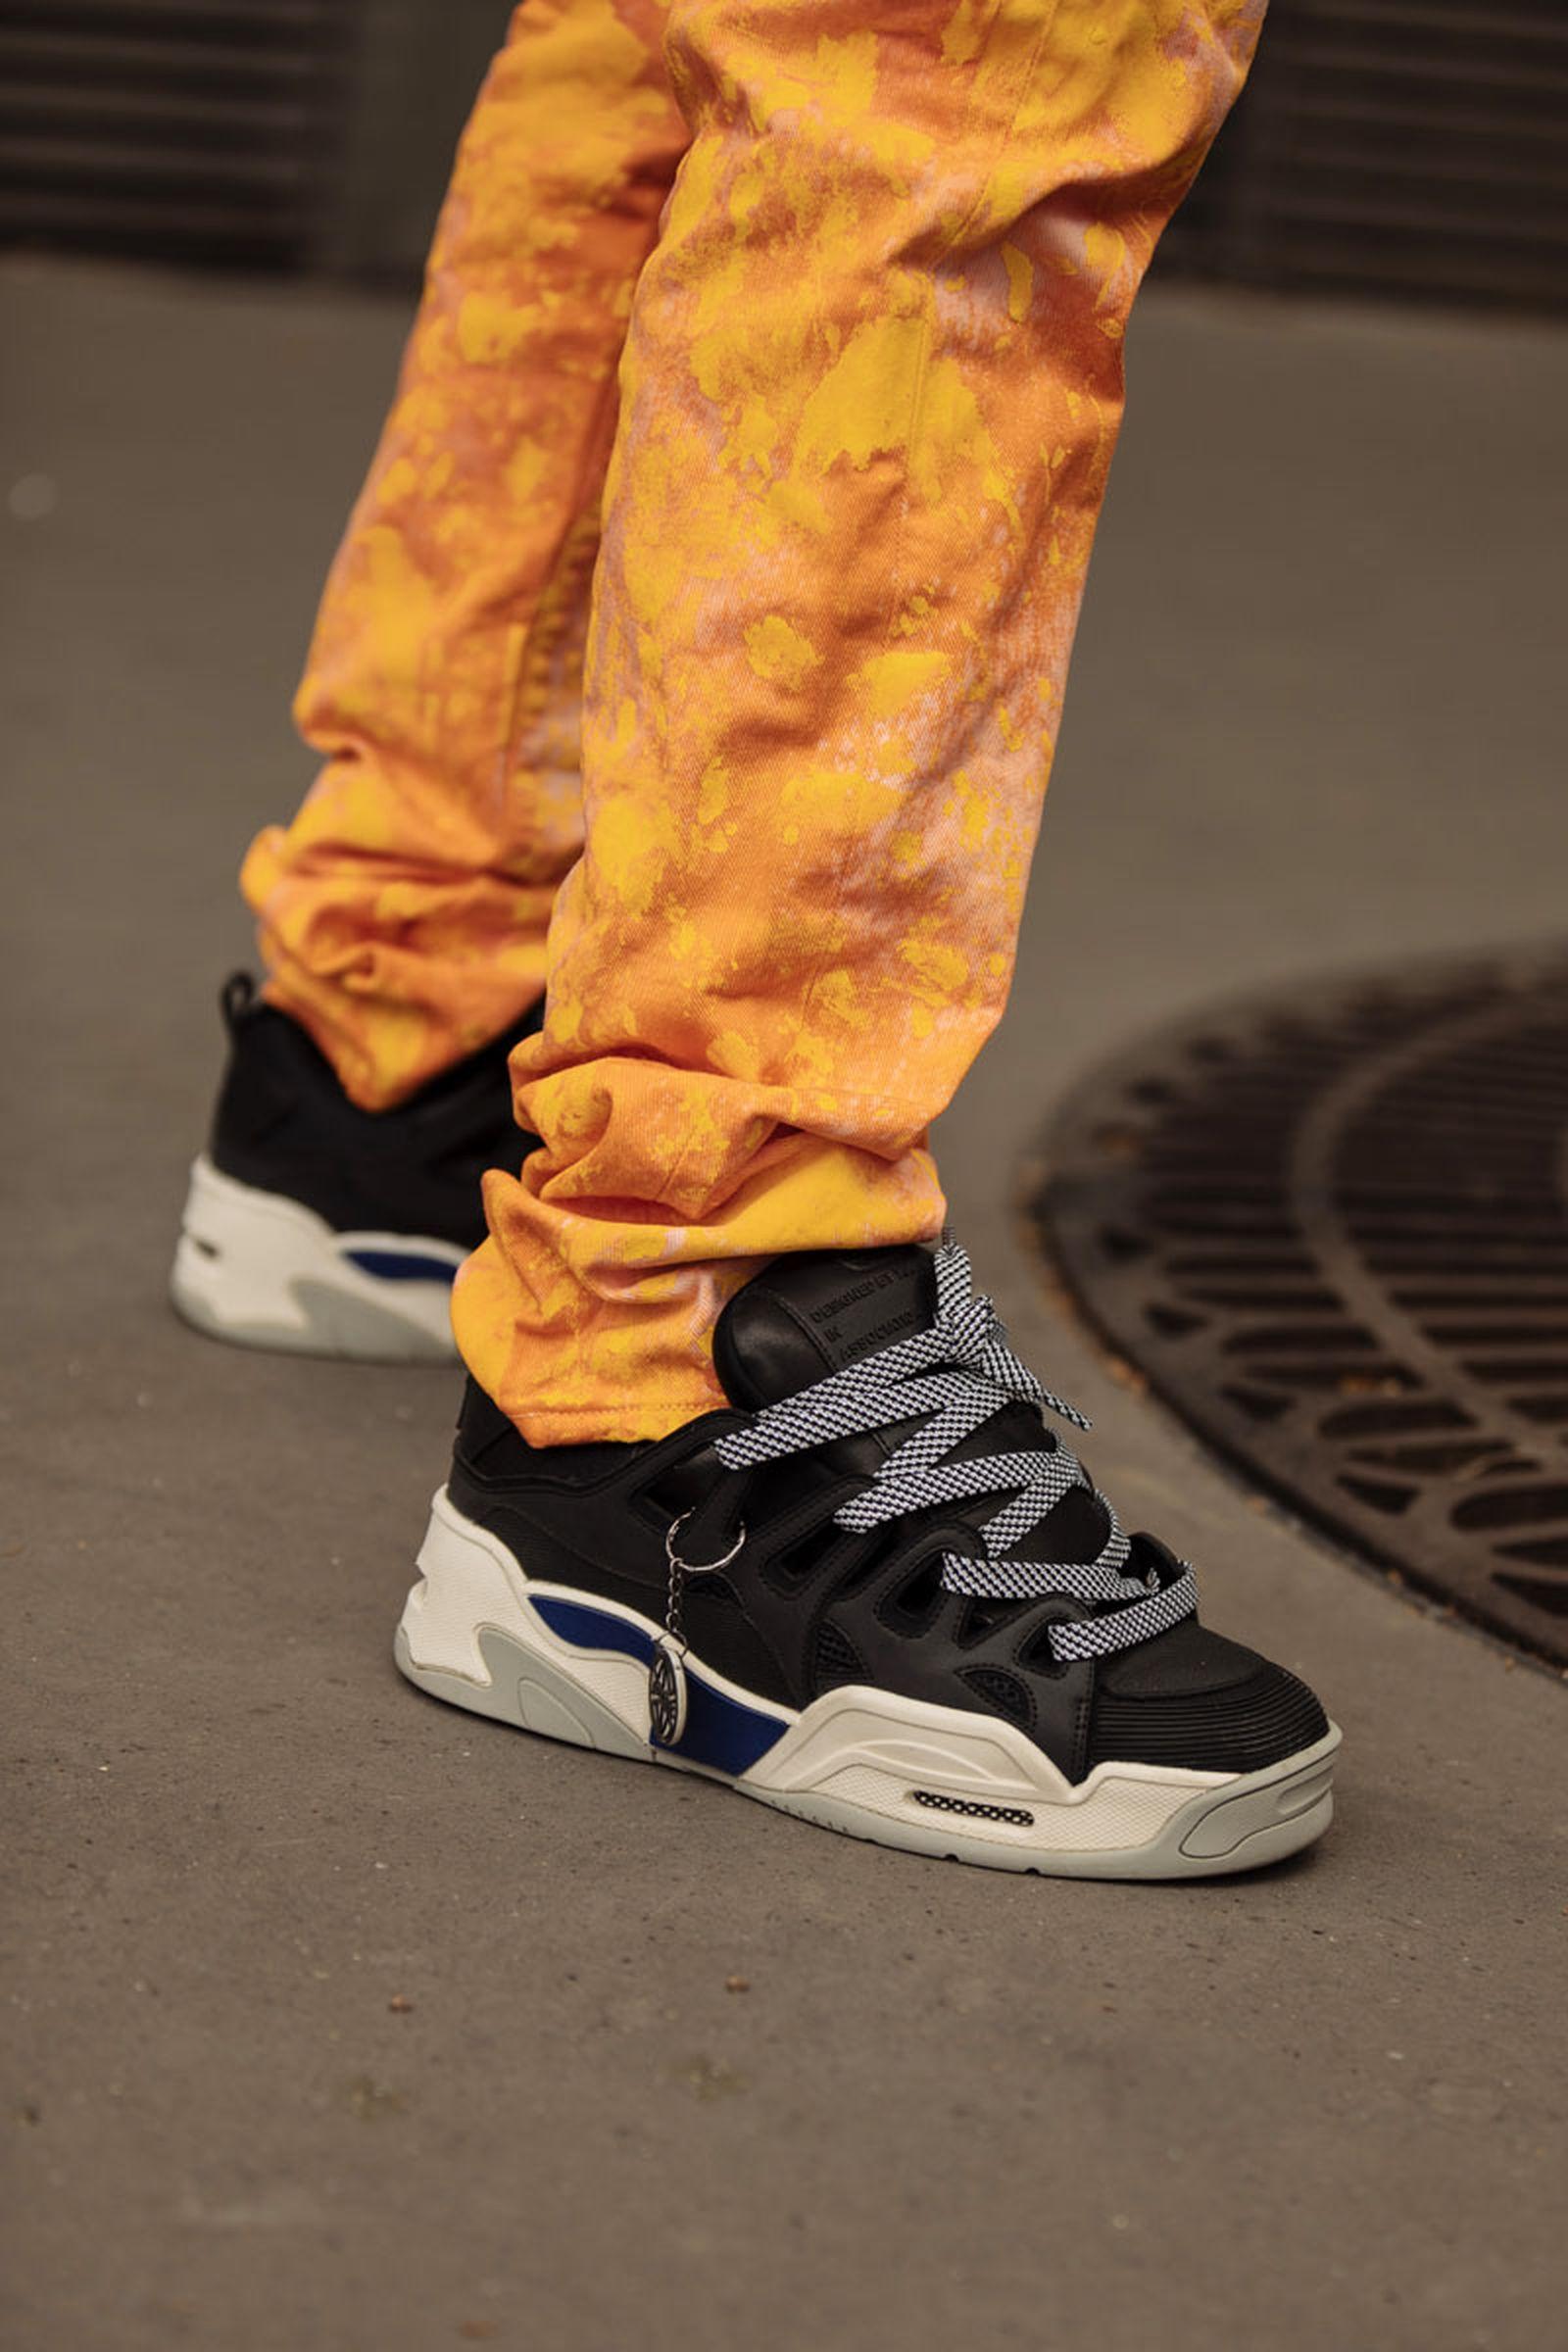 paris fashion week ss20 sneakers 06 Nike comme des garcons li ning